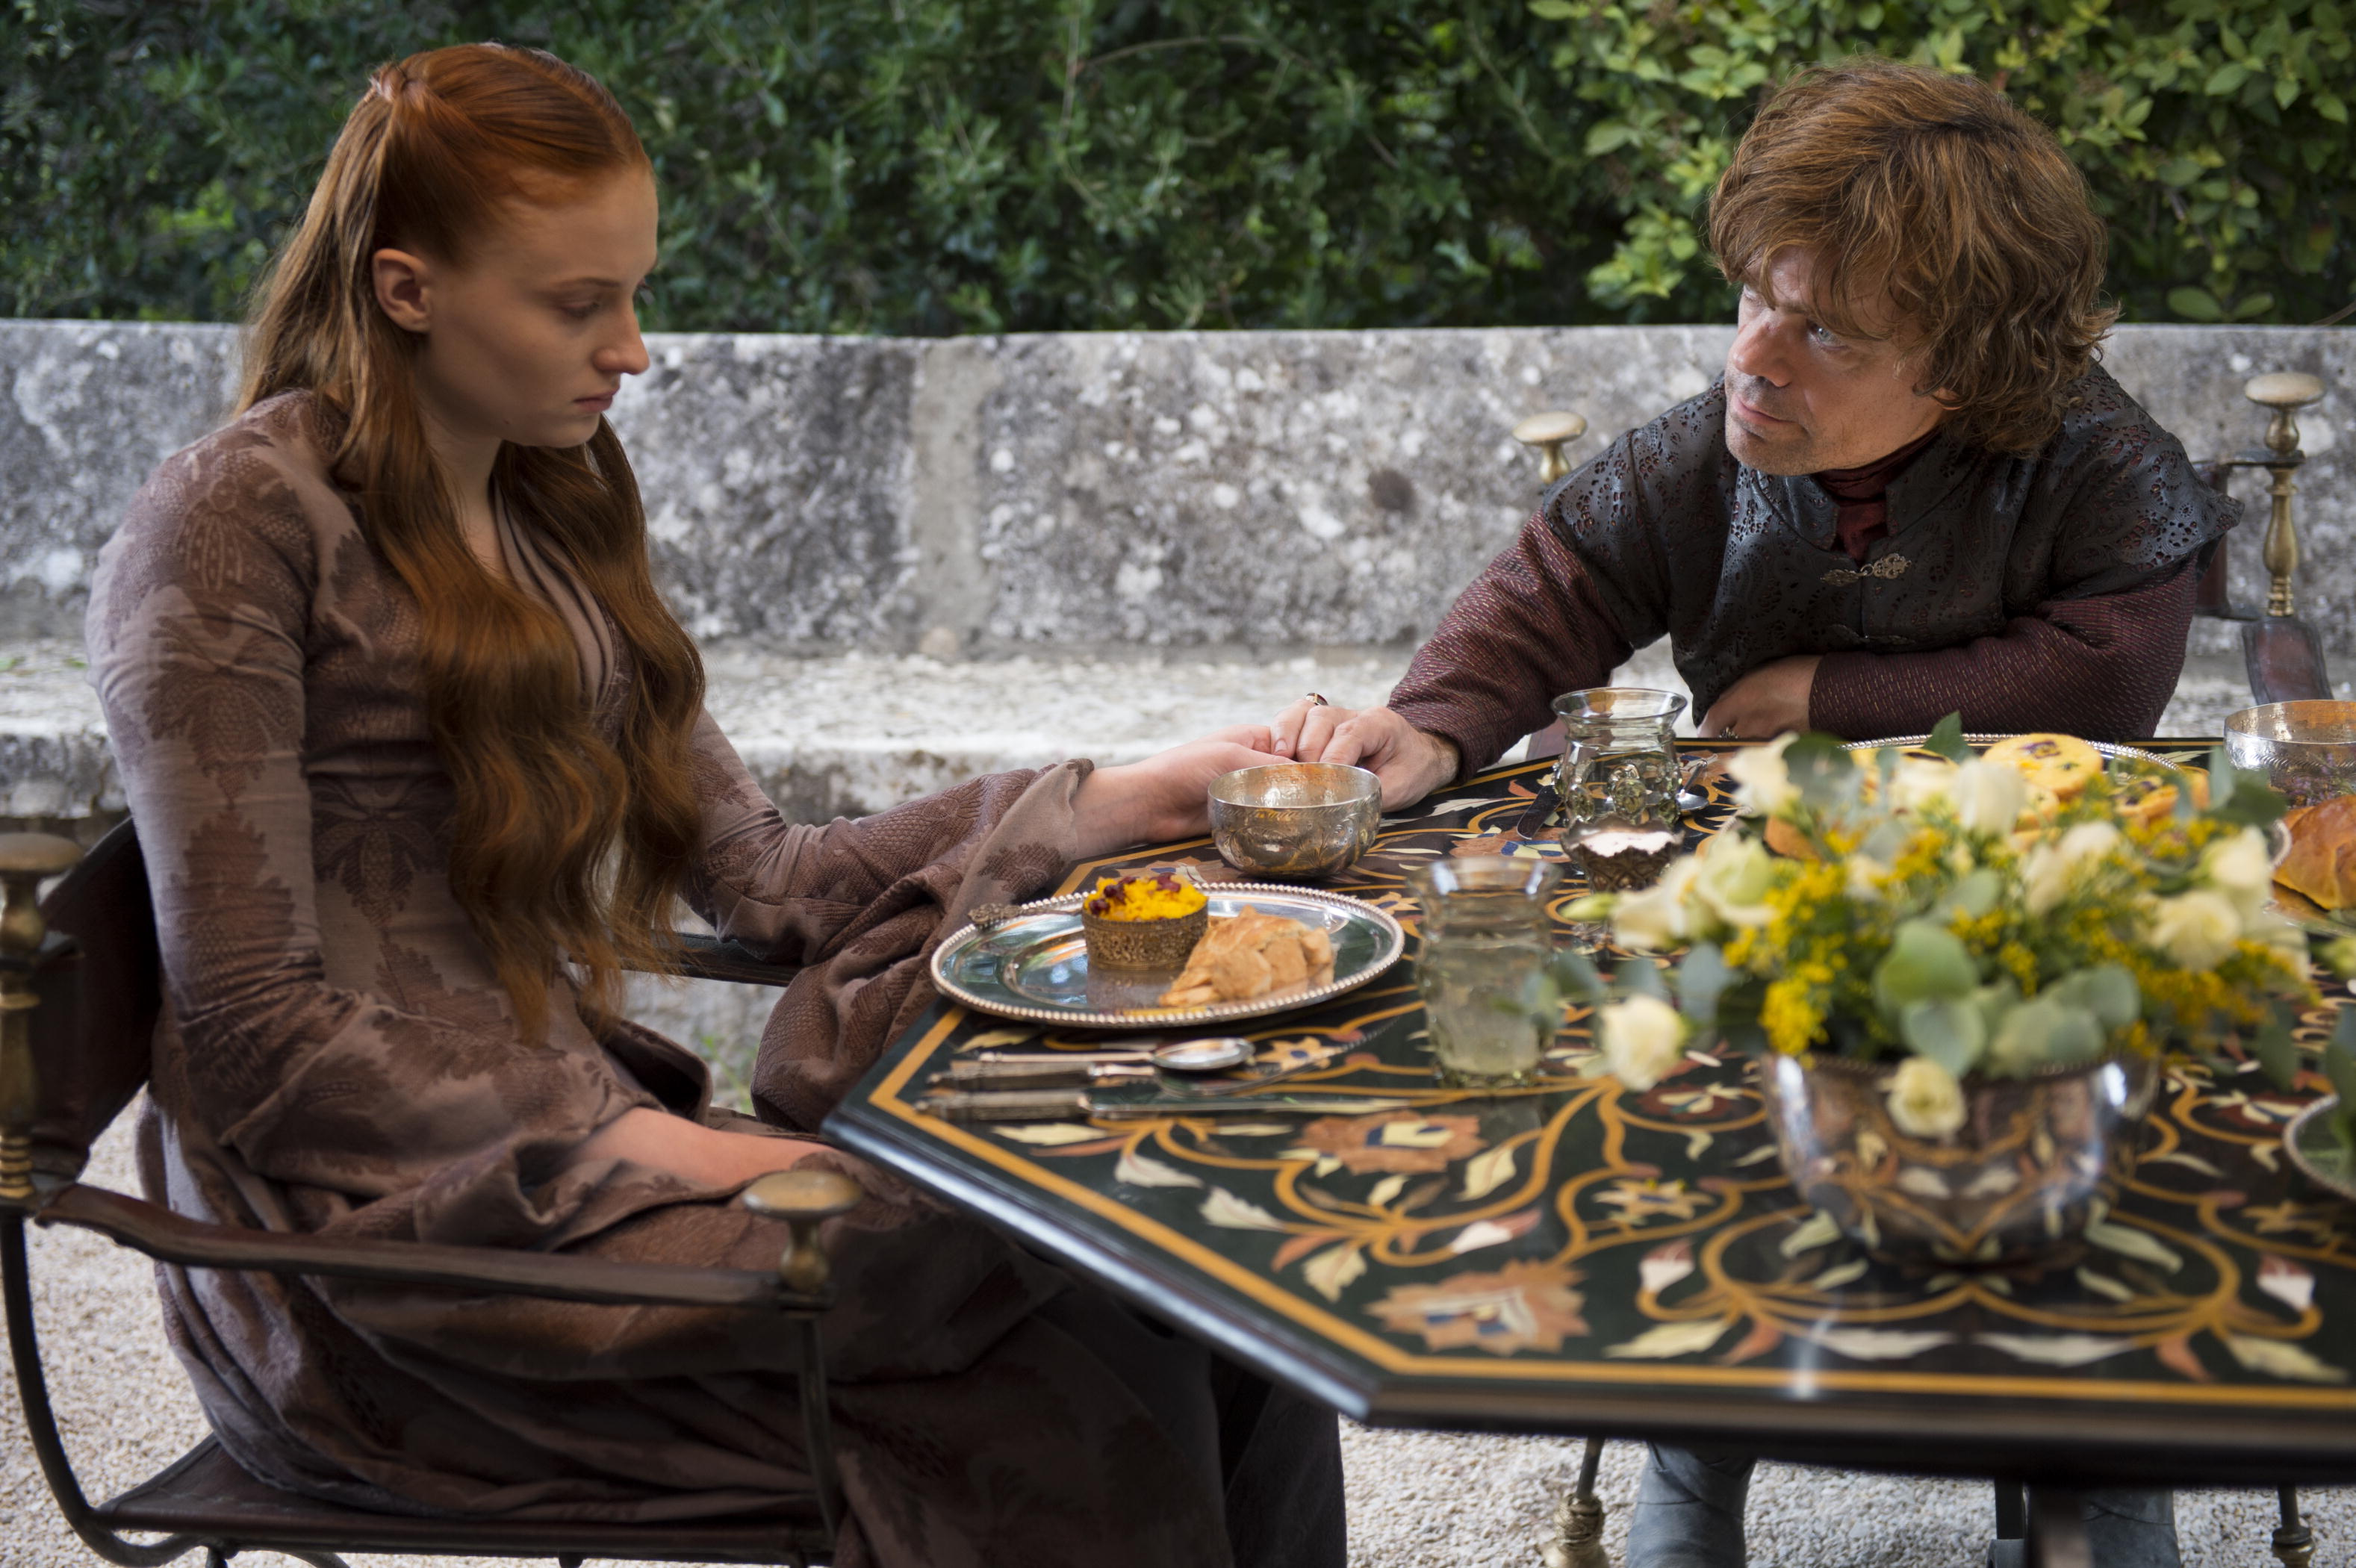 Game-of-Thrones-Season-4-Sophie-Turner-Sansa-Stark-Peter-Dinklage-Tyrion-Lannister